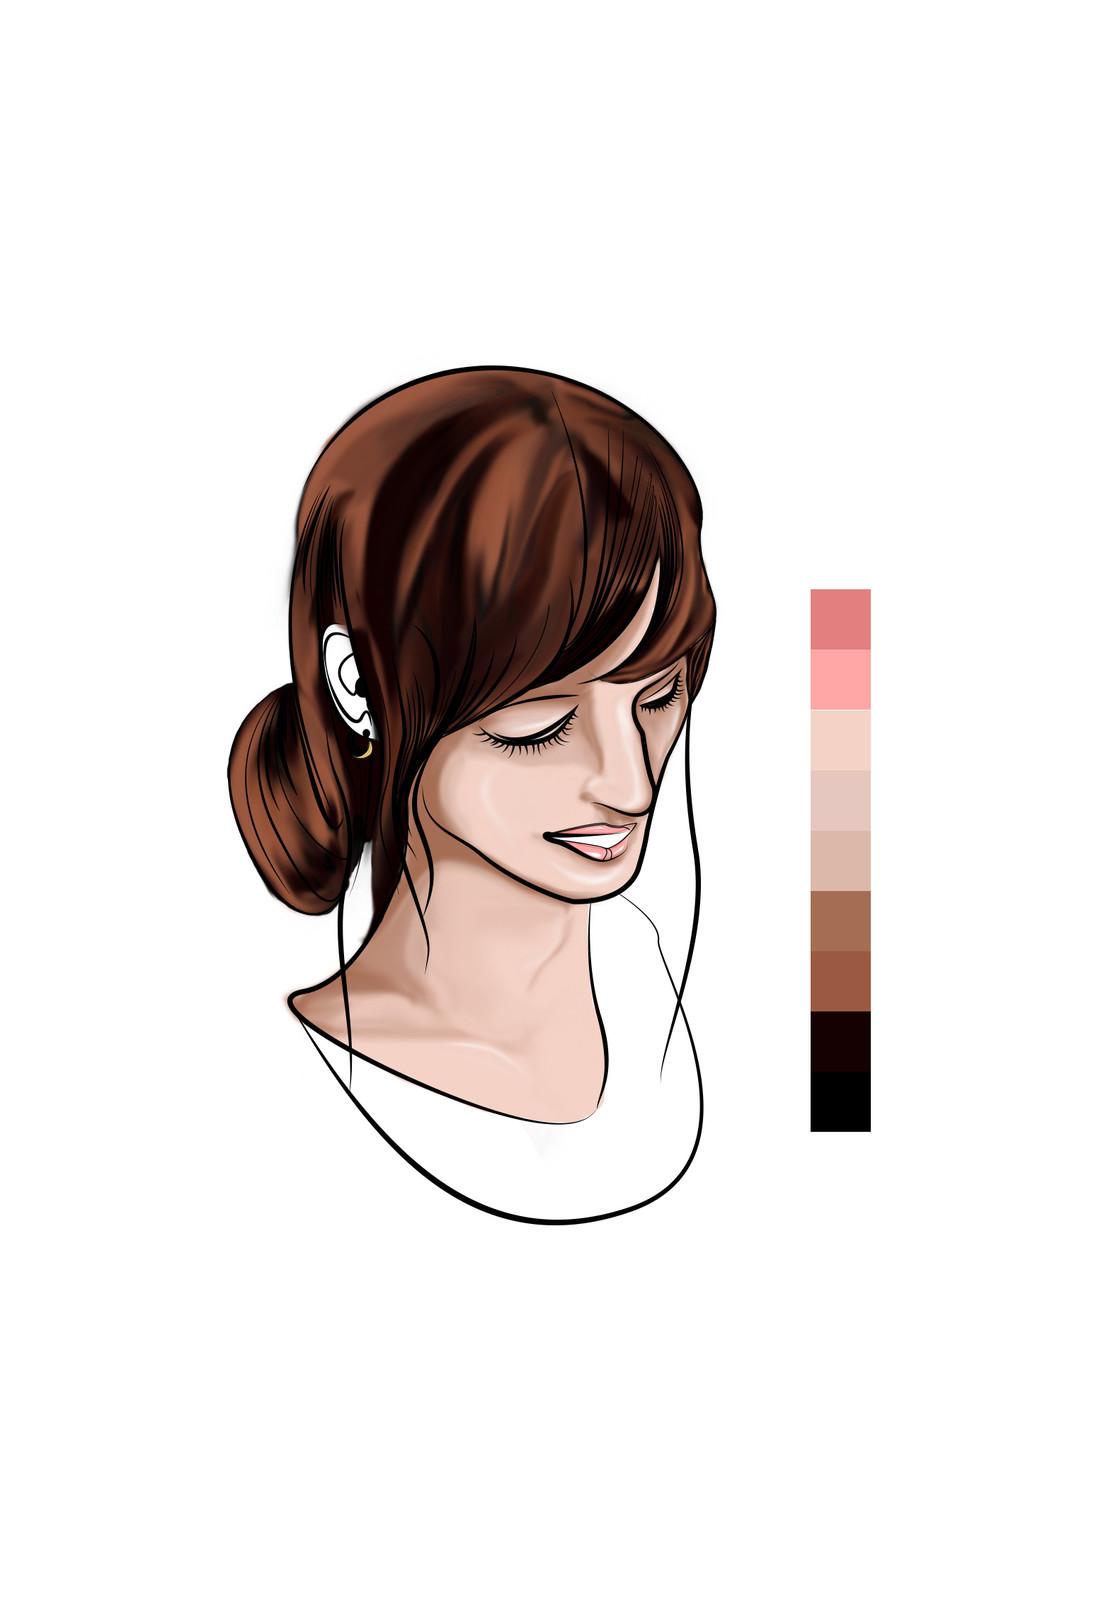 Twelve - Base coloring more detail (Hair)